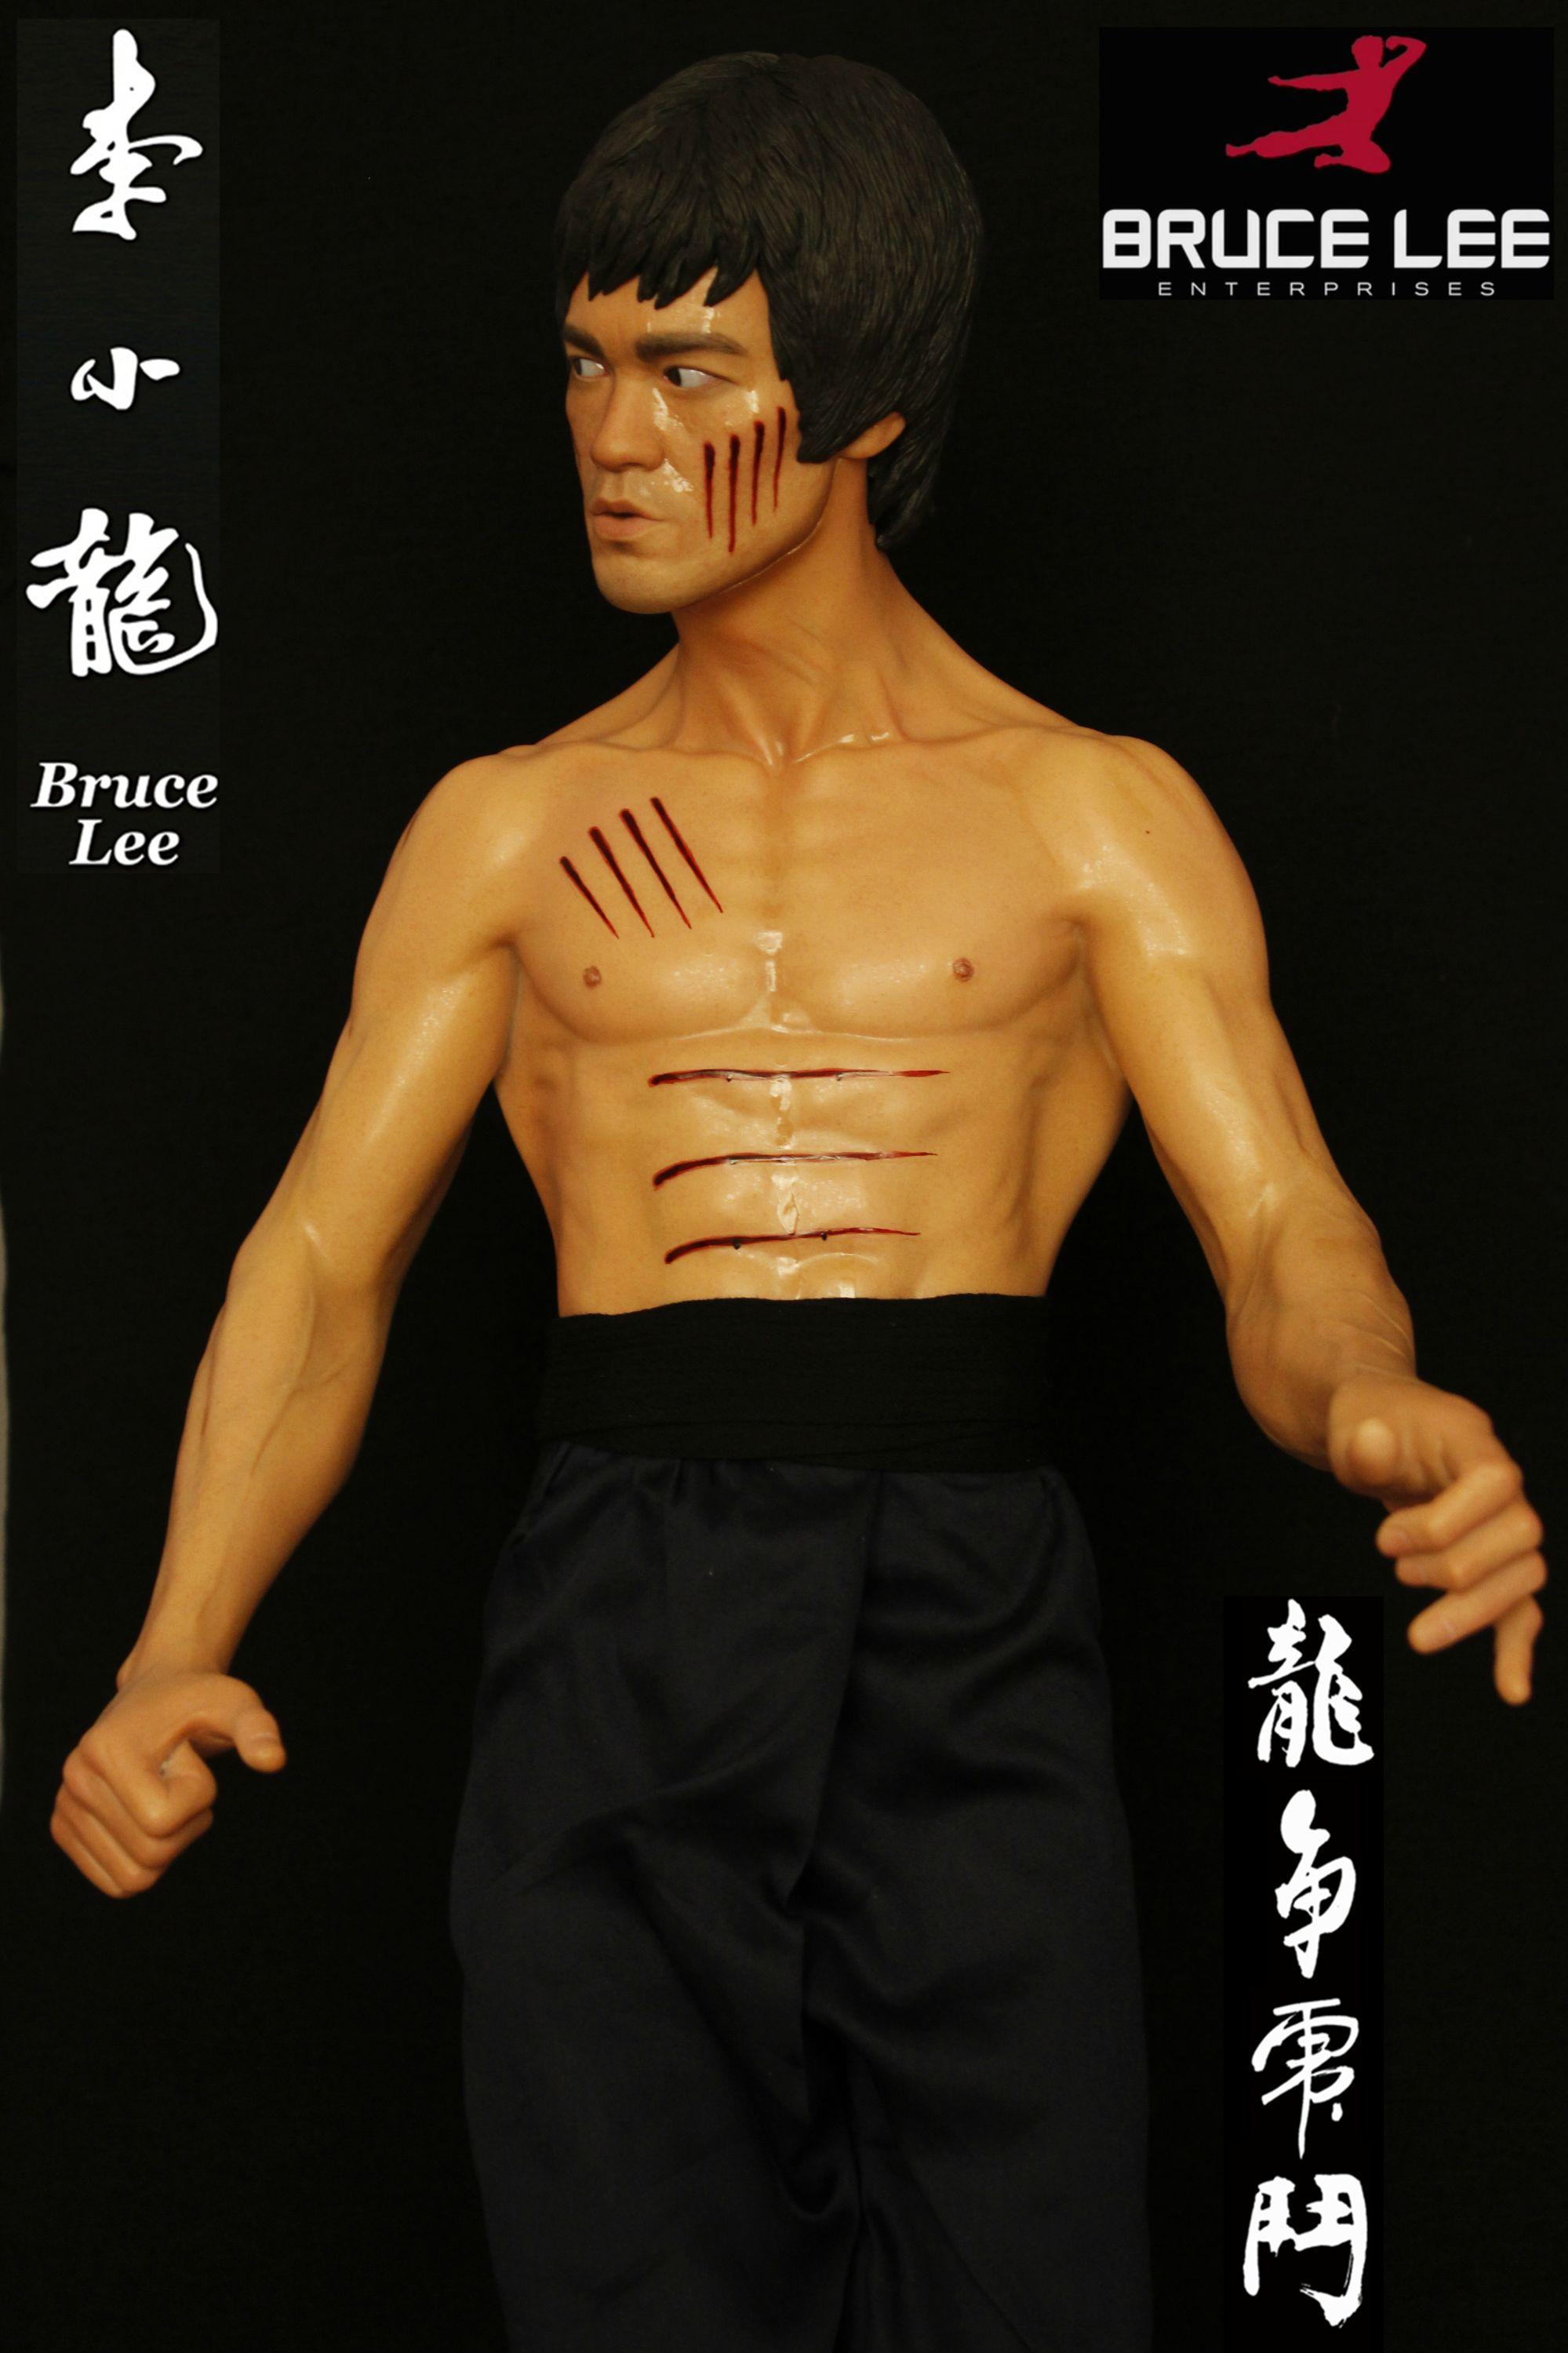 [Blitzway] Bruce Lee Tribute - 1/3 Scale - LANÇADO!!! - Página 6 212422tff5ct5woh8stww2